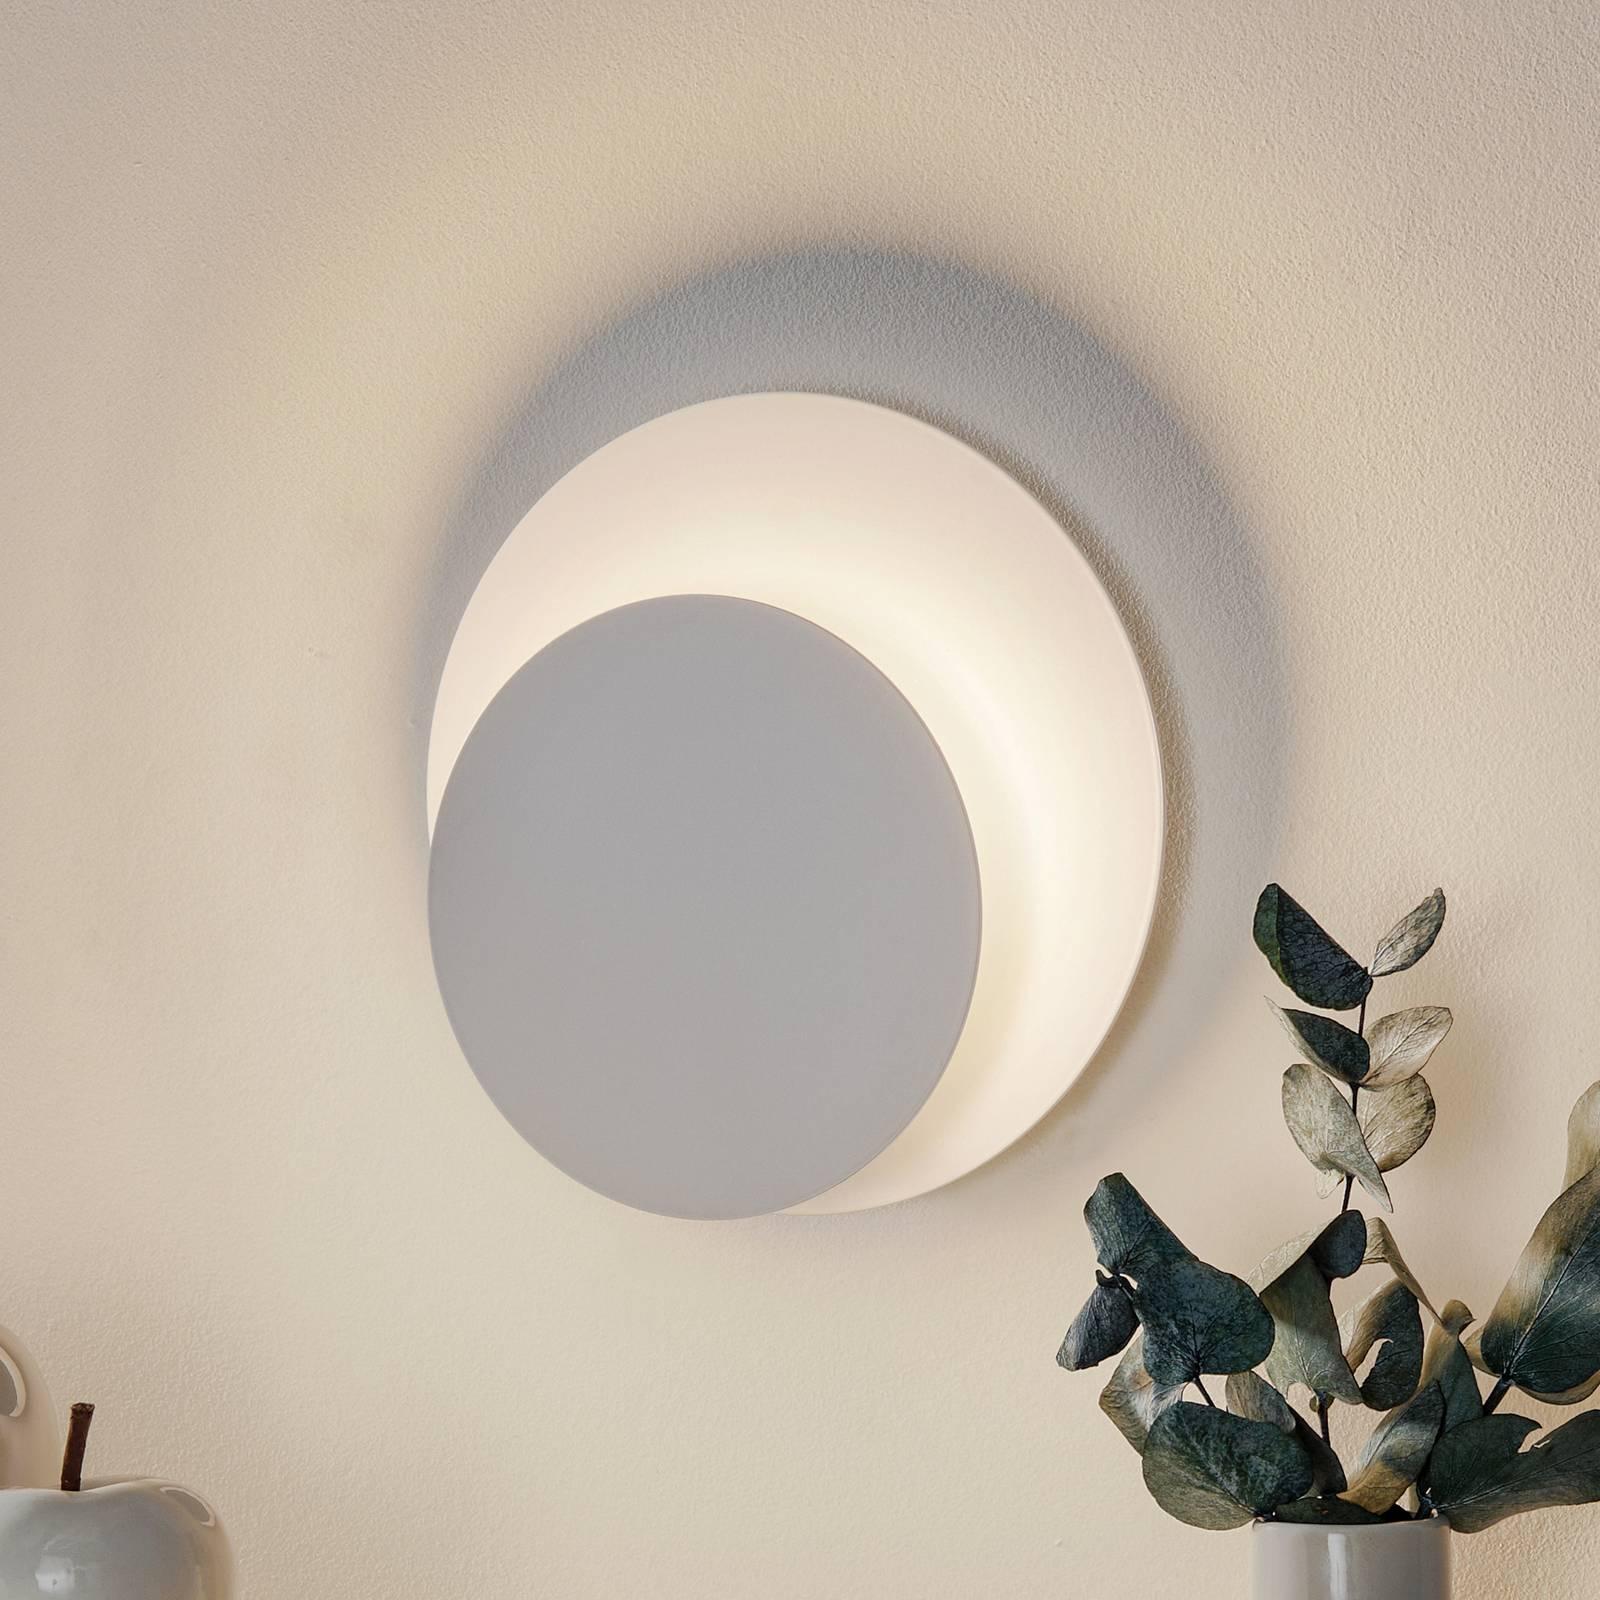 Wandlamp Circle in ronde vorm, wit